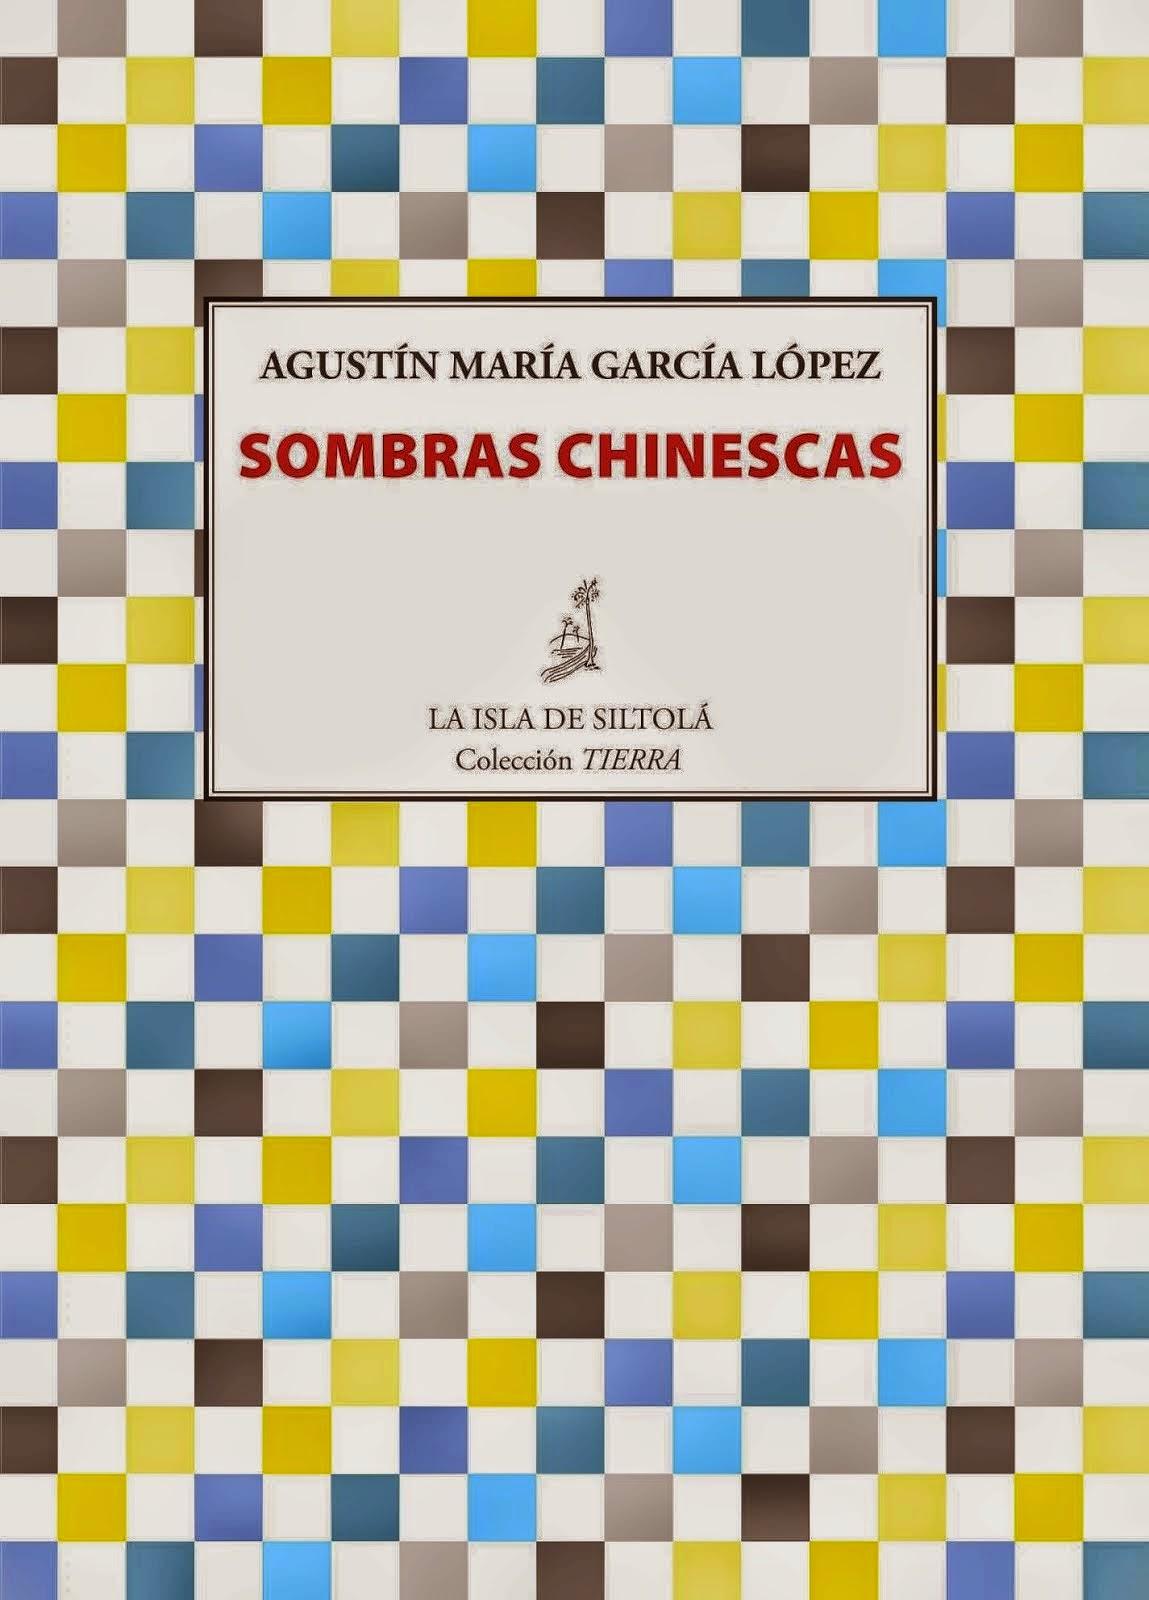 http://encuentrosconlasletras.blogspot.com.es/2015/04/sombras-chinescas.html